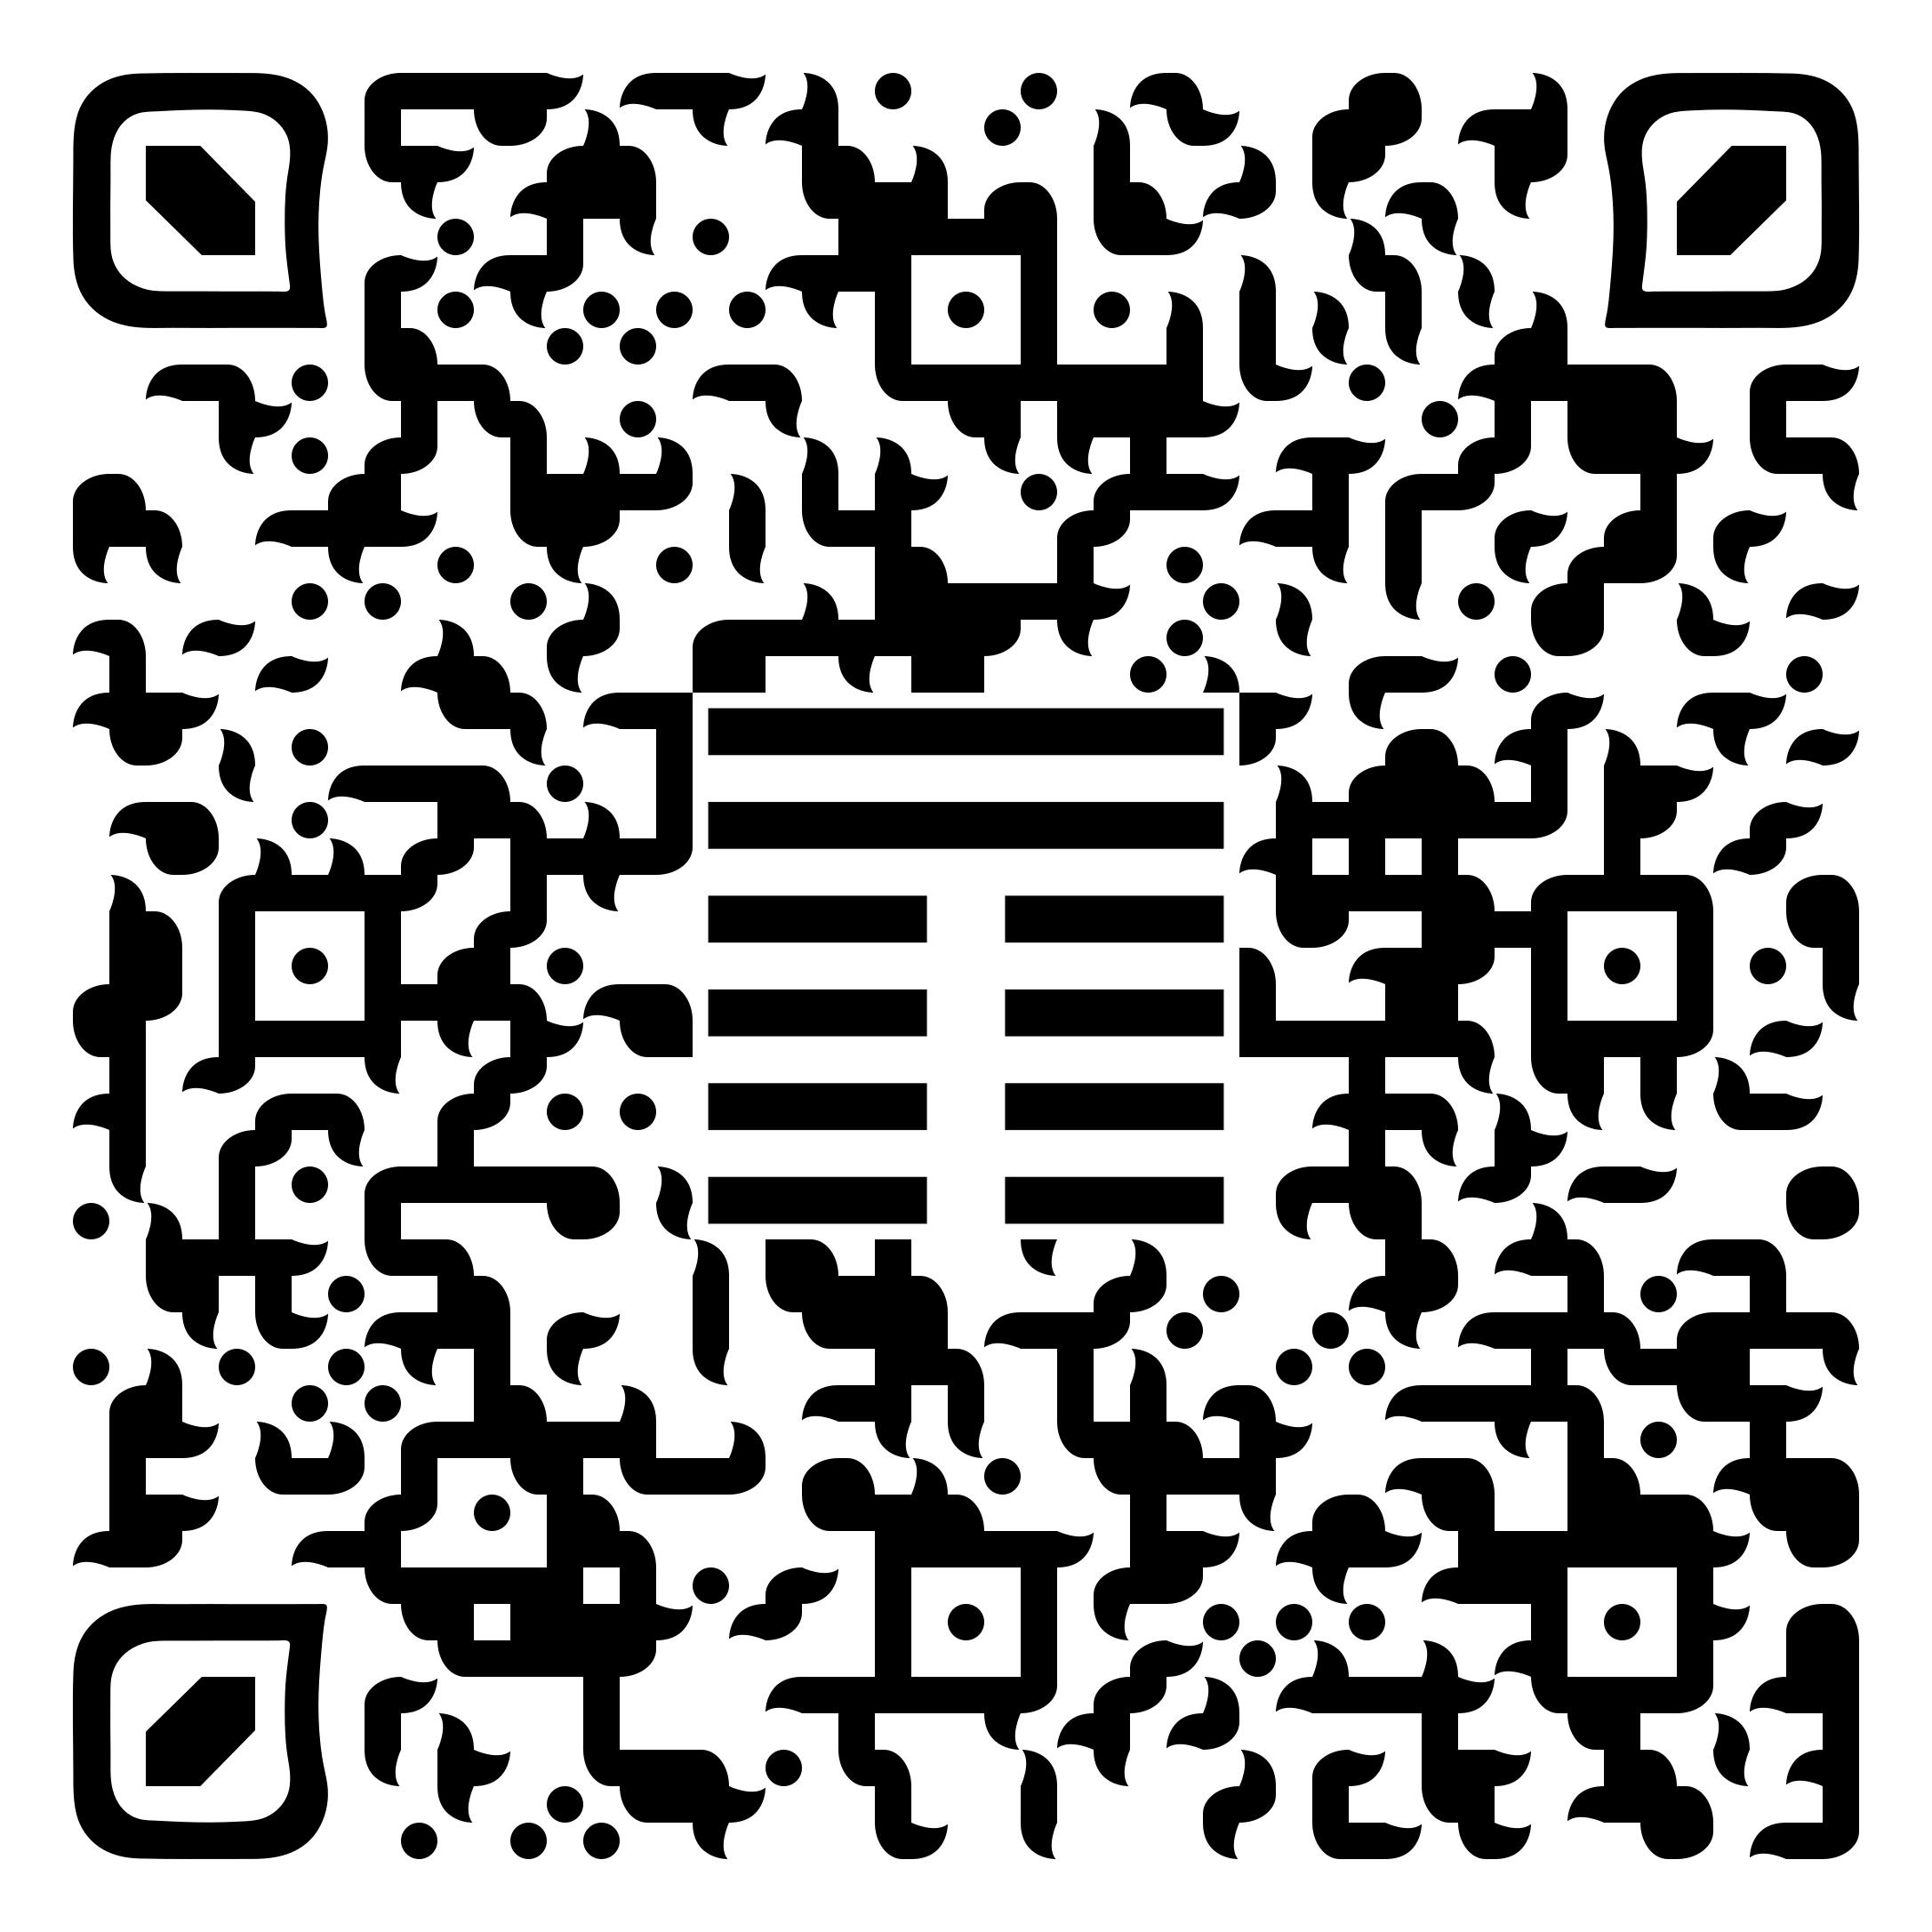 qr-code-20.png